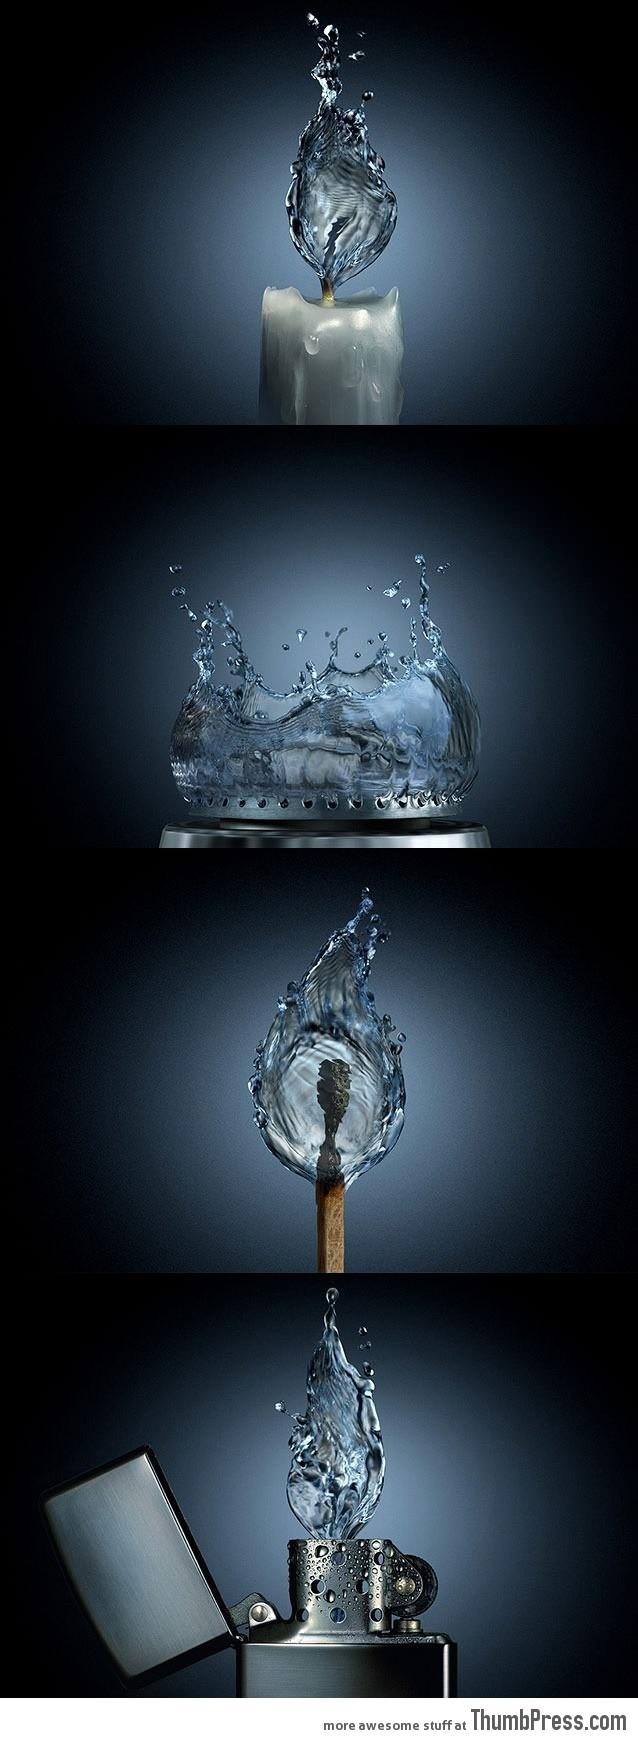 If fire were water